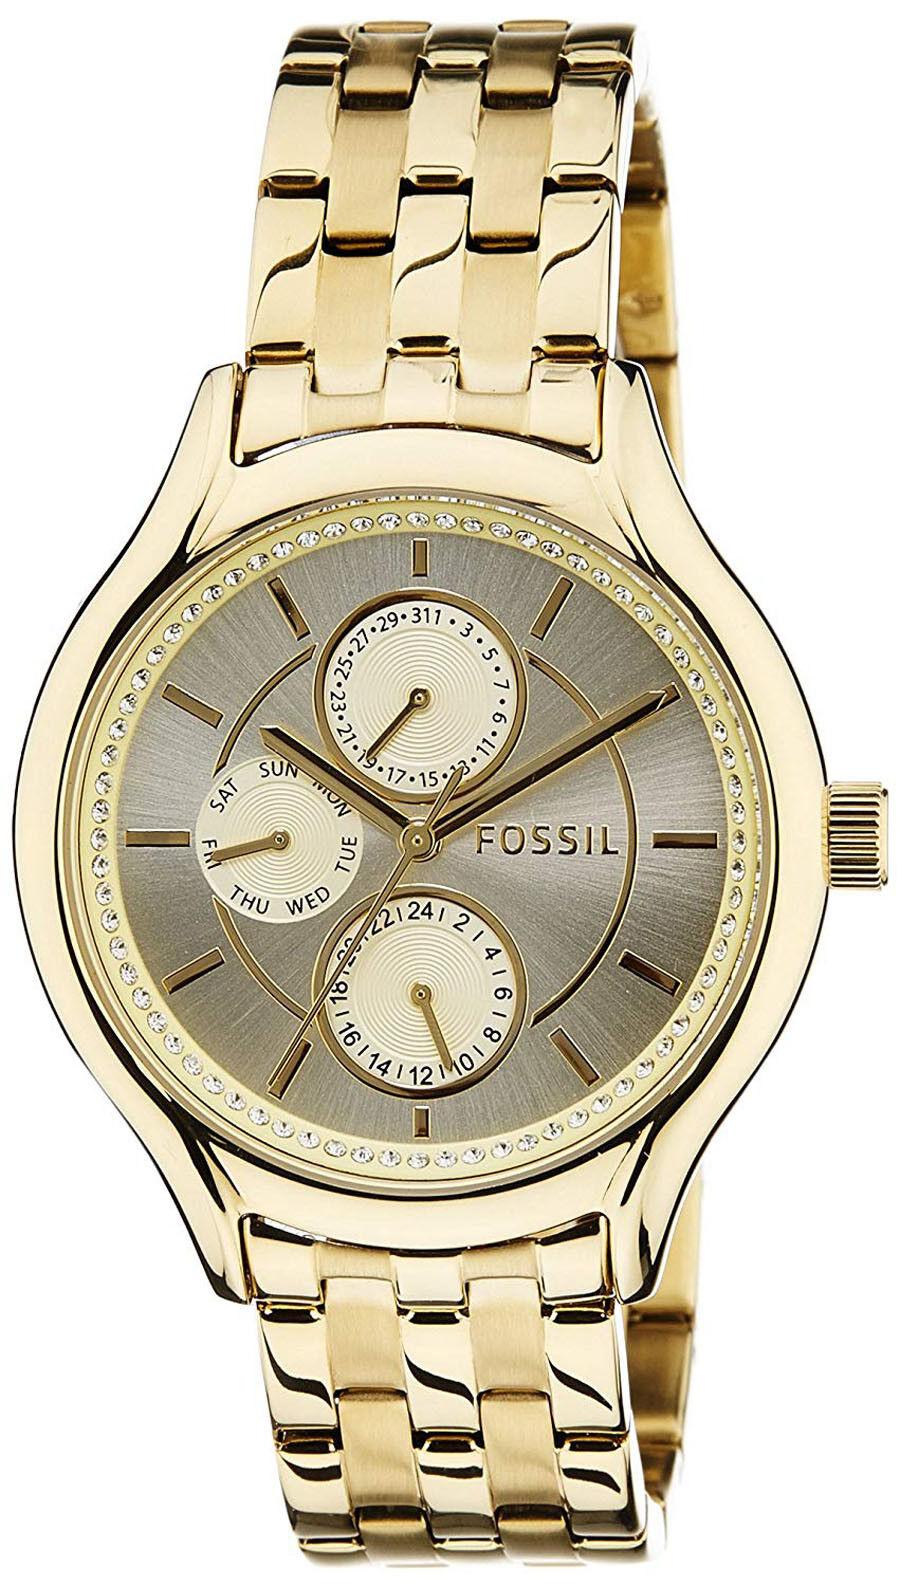 Fossil Gold Tone Daydreamer Analog Womens Watch Bq1583 Ebay Idealist Silver Es4194 Norton Secured Powered By Verisign